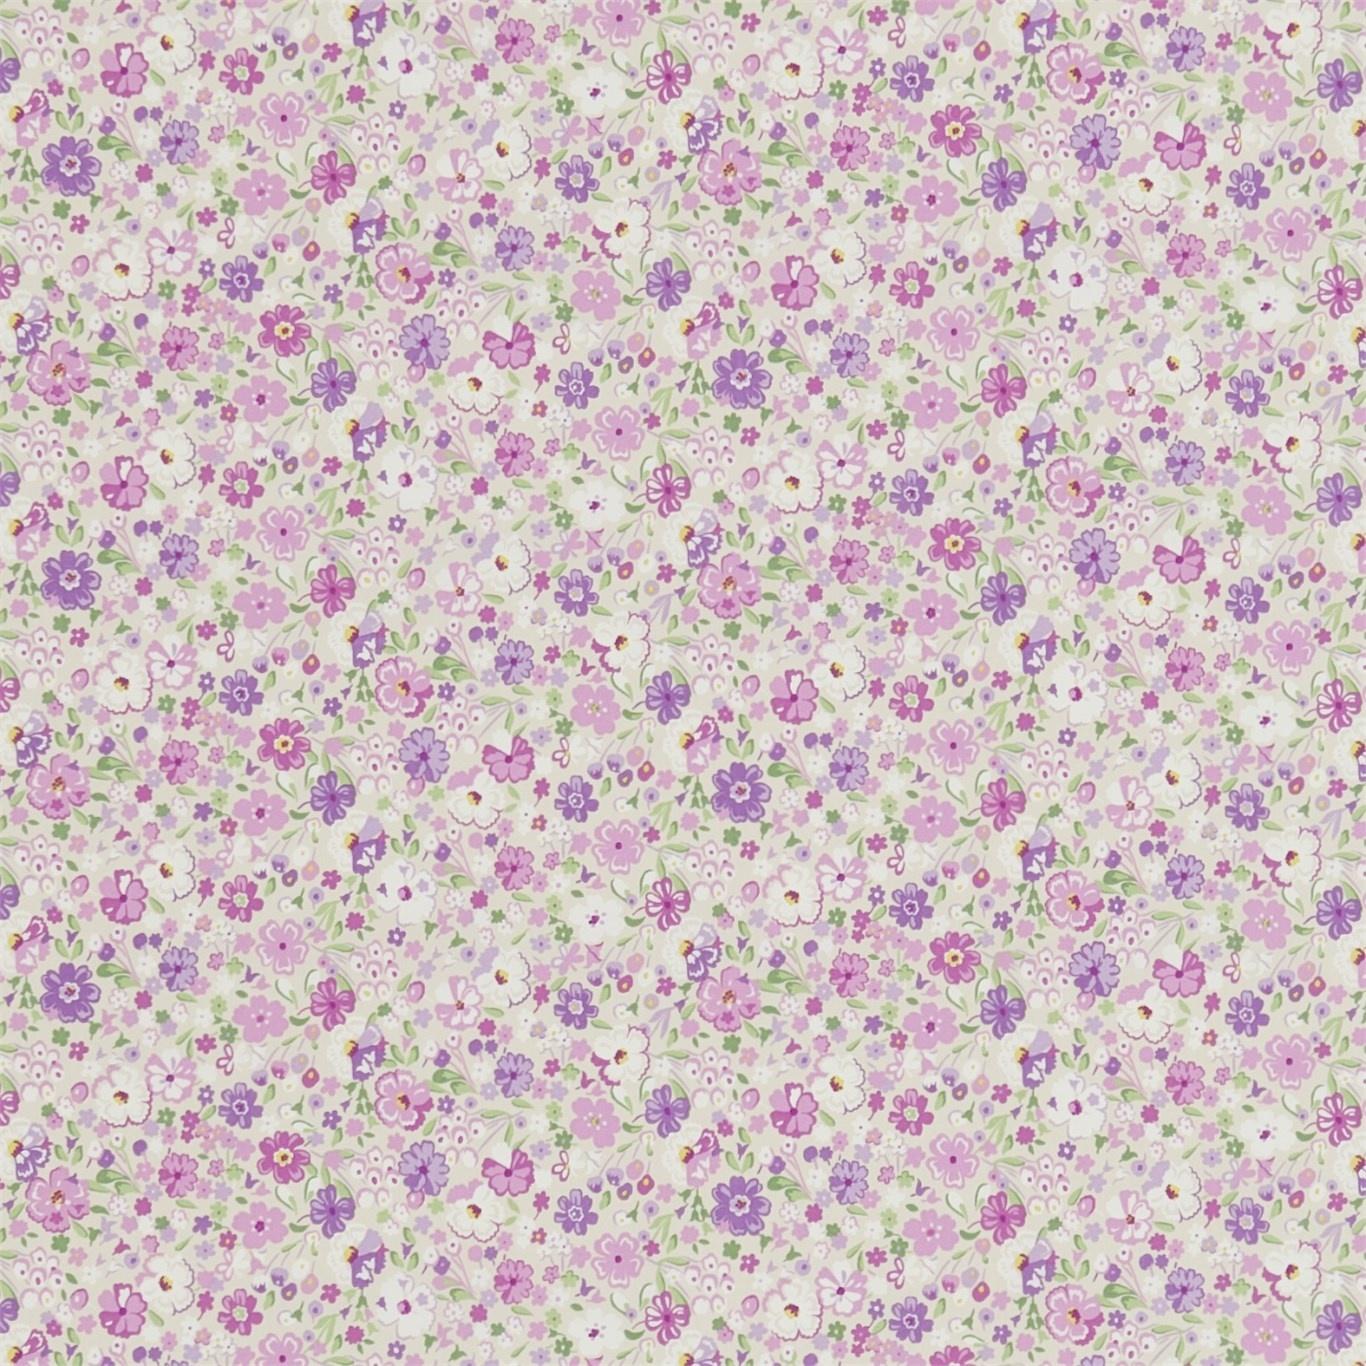 Image of Sanderson Posy Floral Lavender Fabric 223904